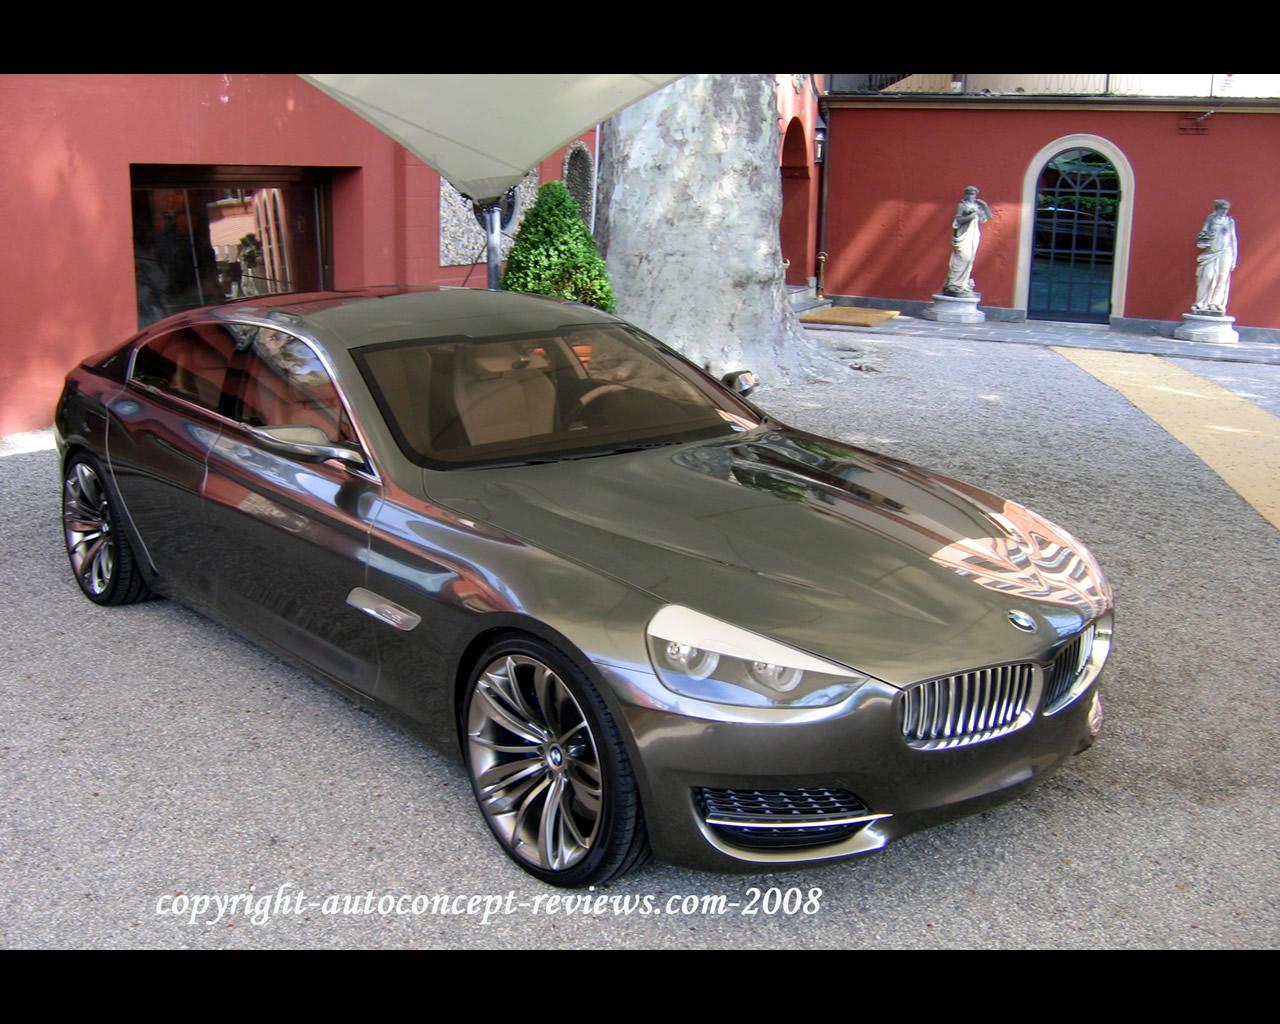 Bmw concept cs 2007 bmw concept cs 2007